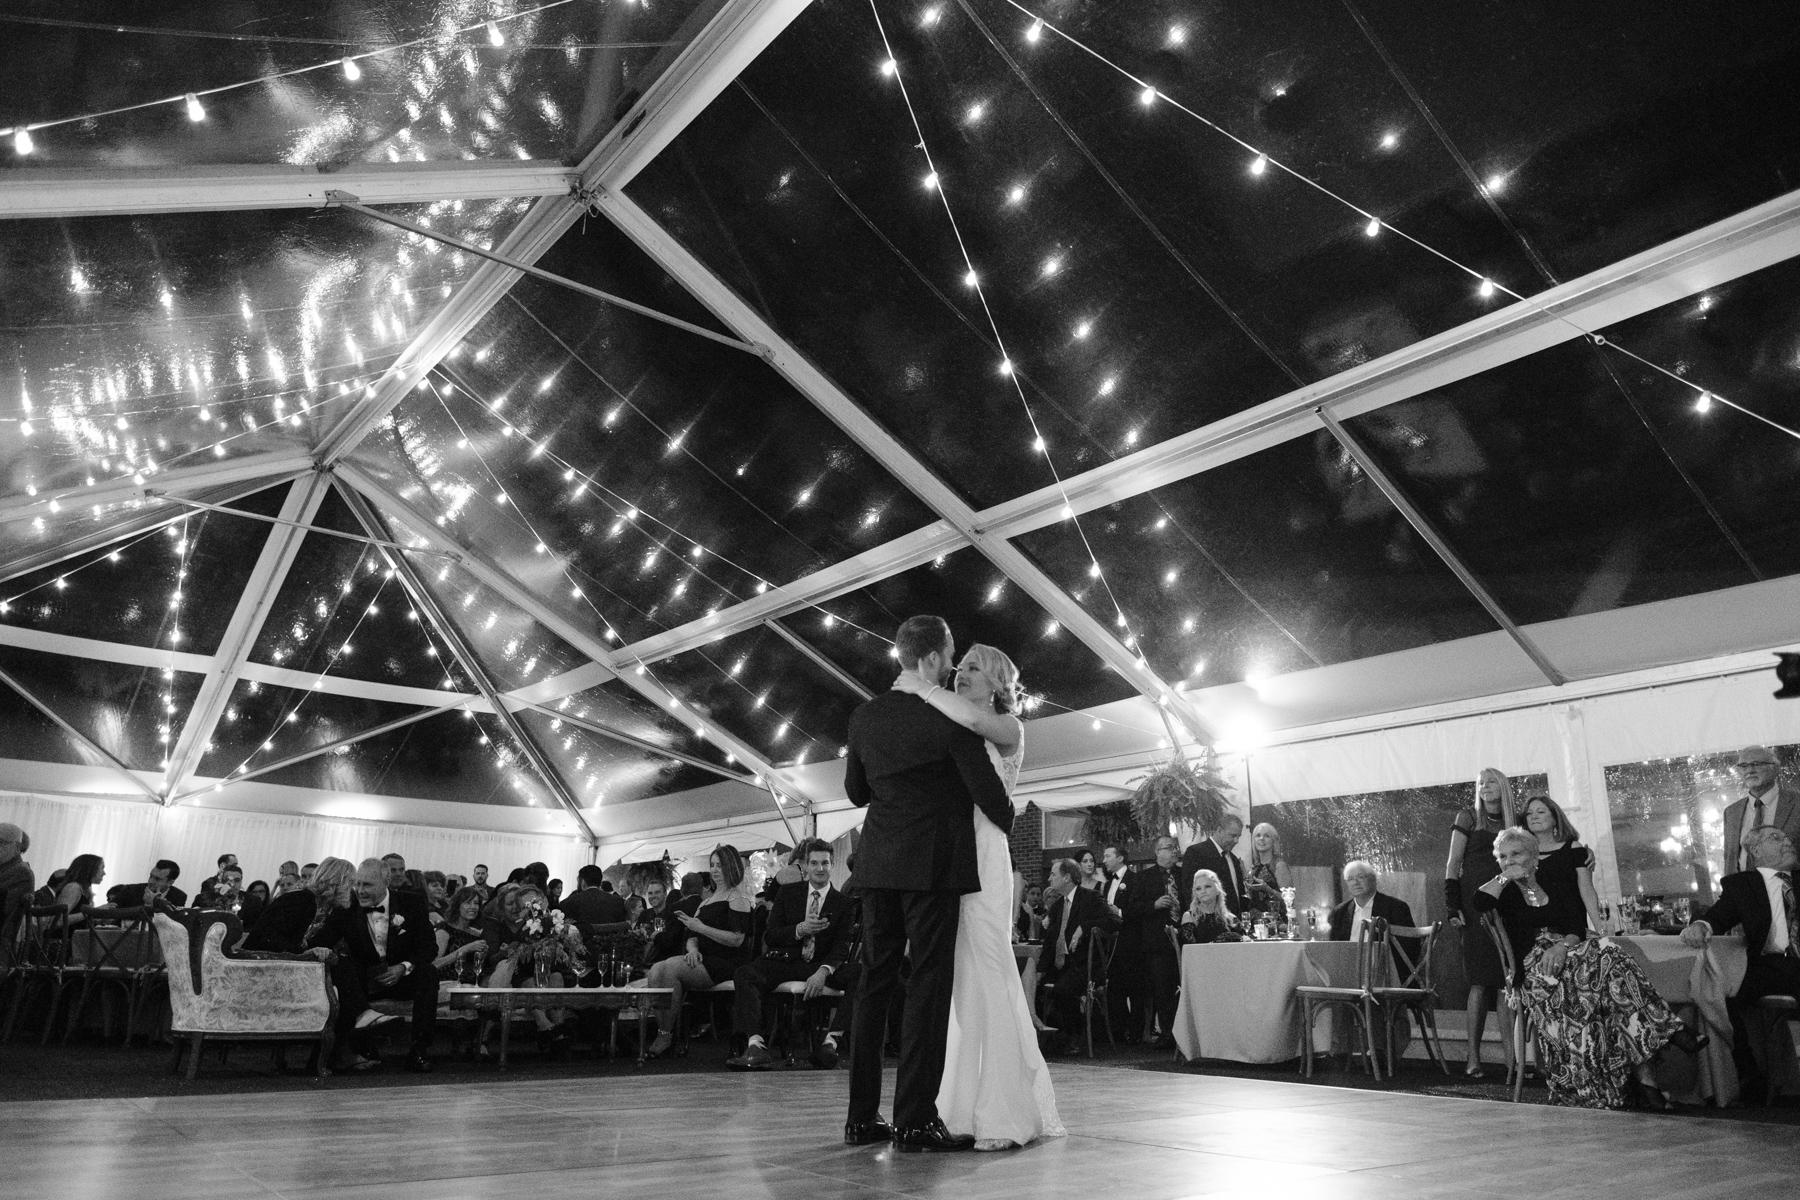 2017_BAP_KalliMatt_Gleneagles_CountryClub_Lemont_Wedding-73.jpg